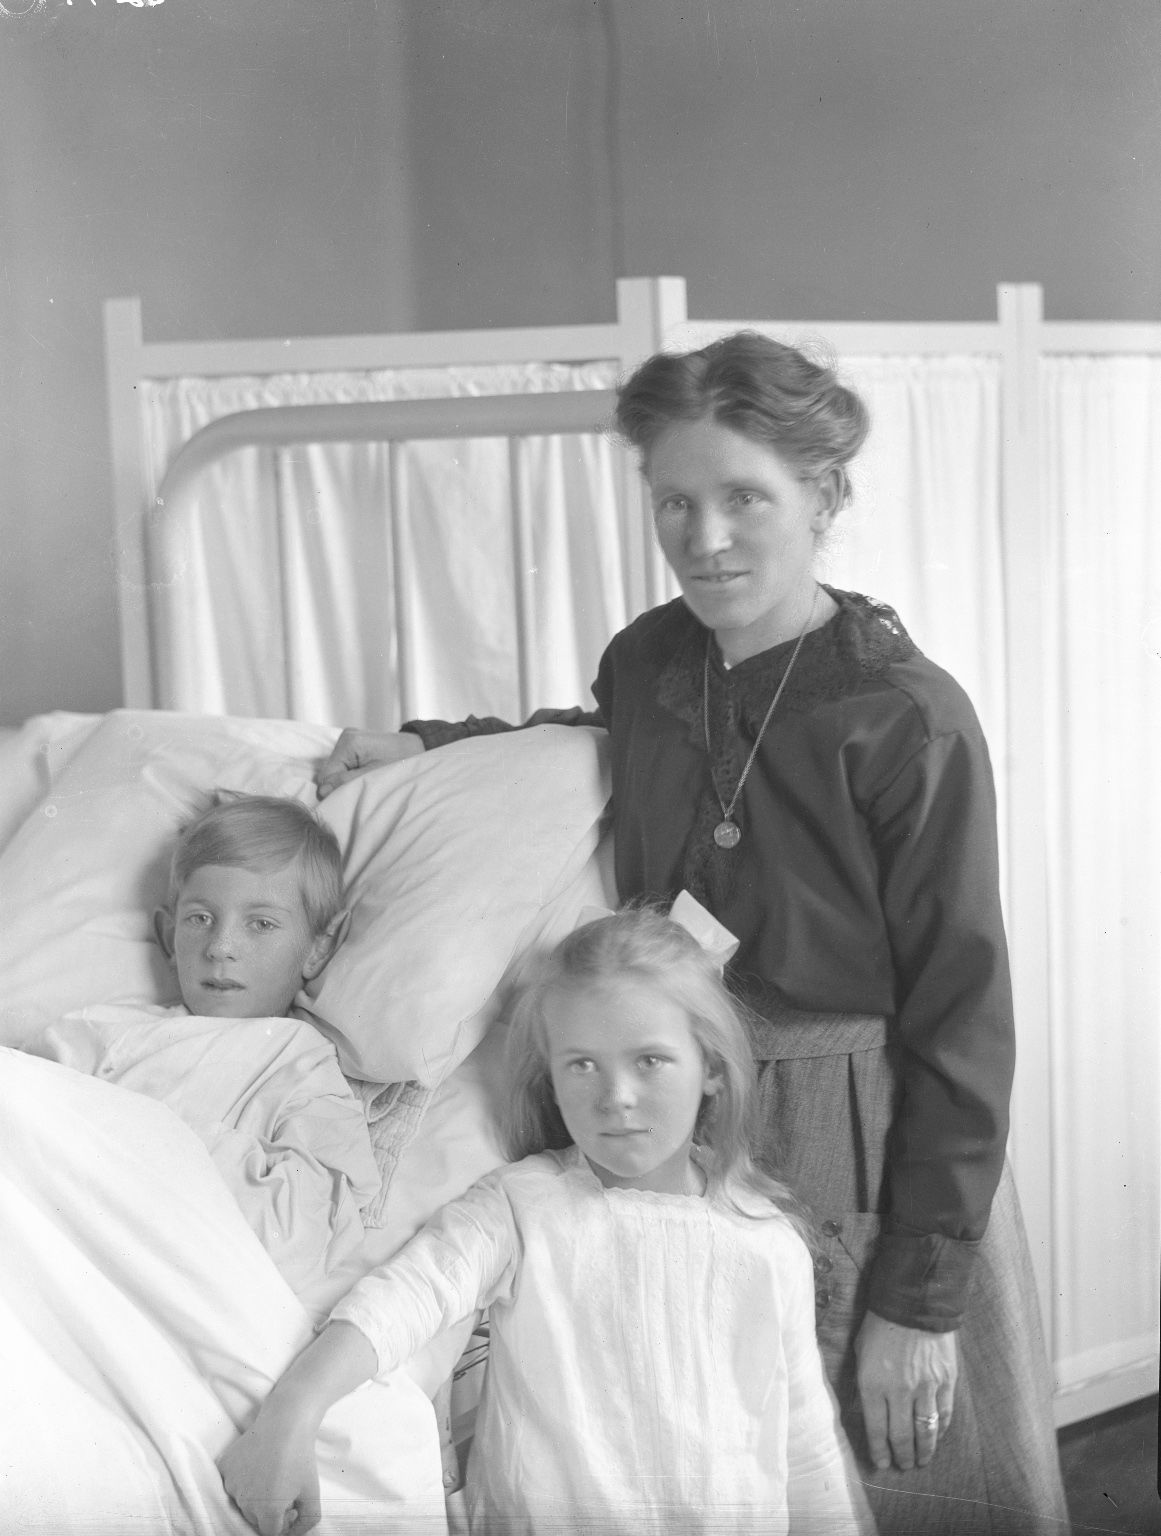 William Daniels at children's hospital